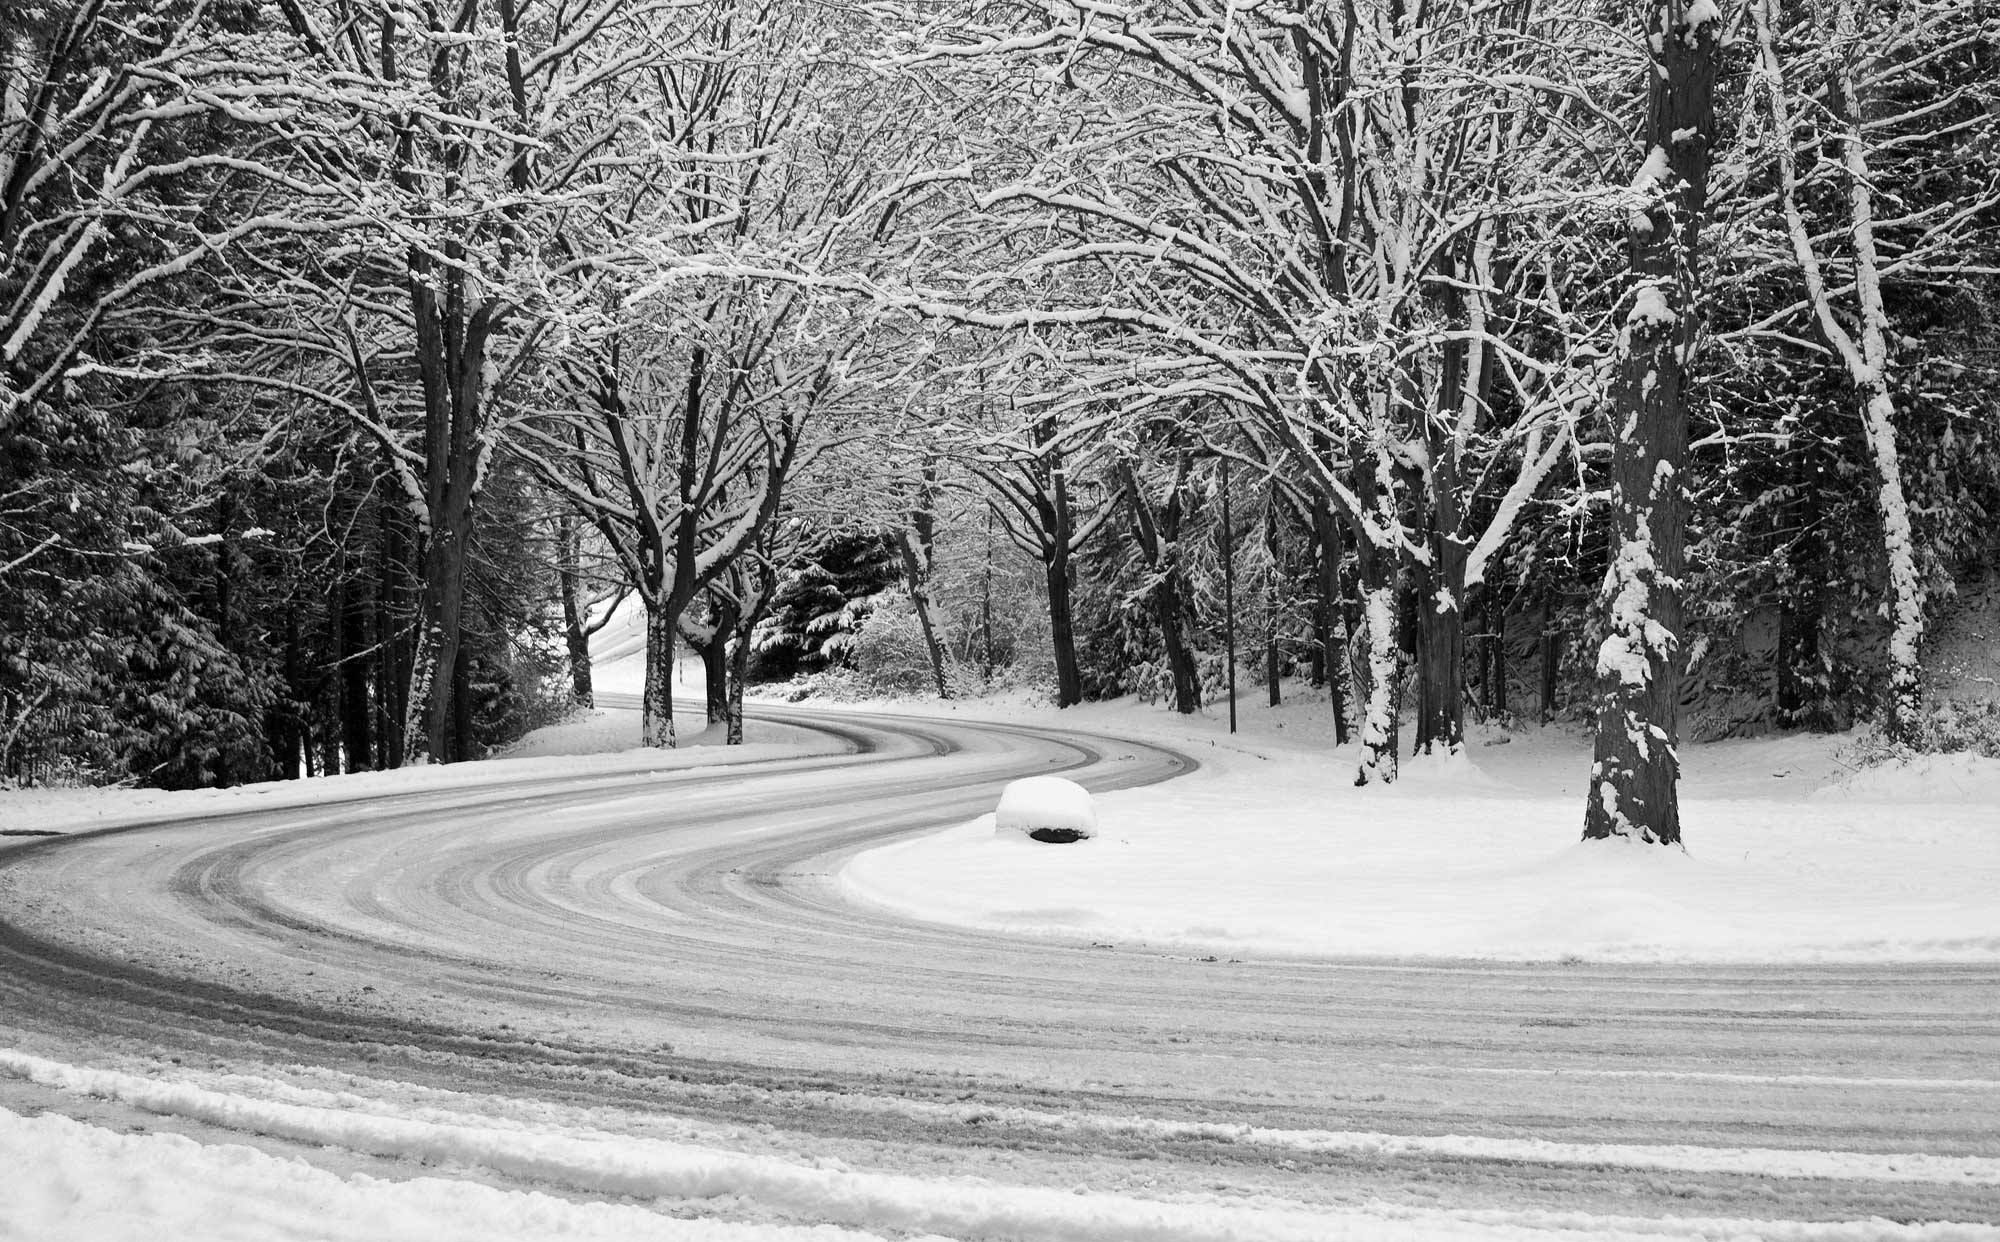 Lake Washington Boulevard